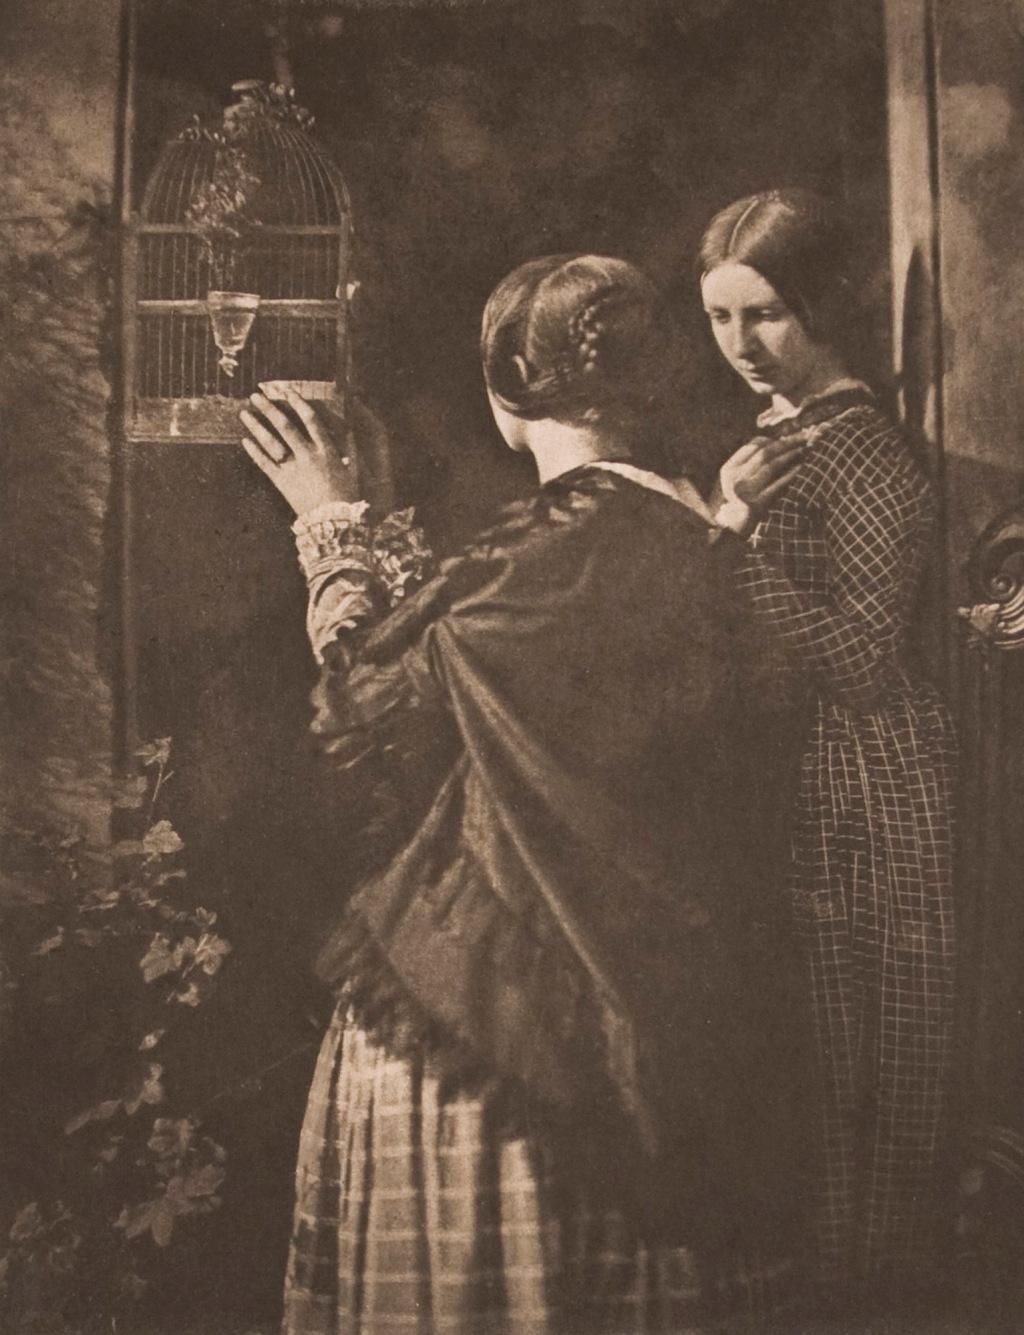 The Bird Cage - Taken 1845 by David Octavius Hill and Robert Adamson